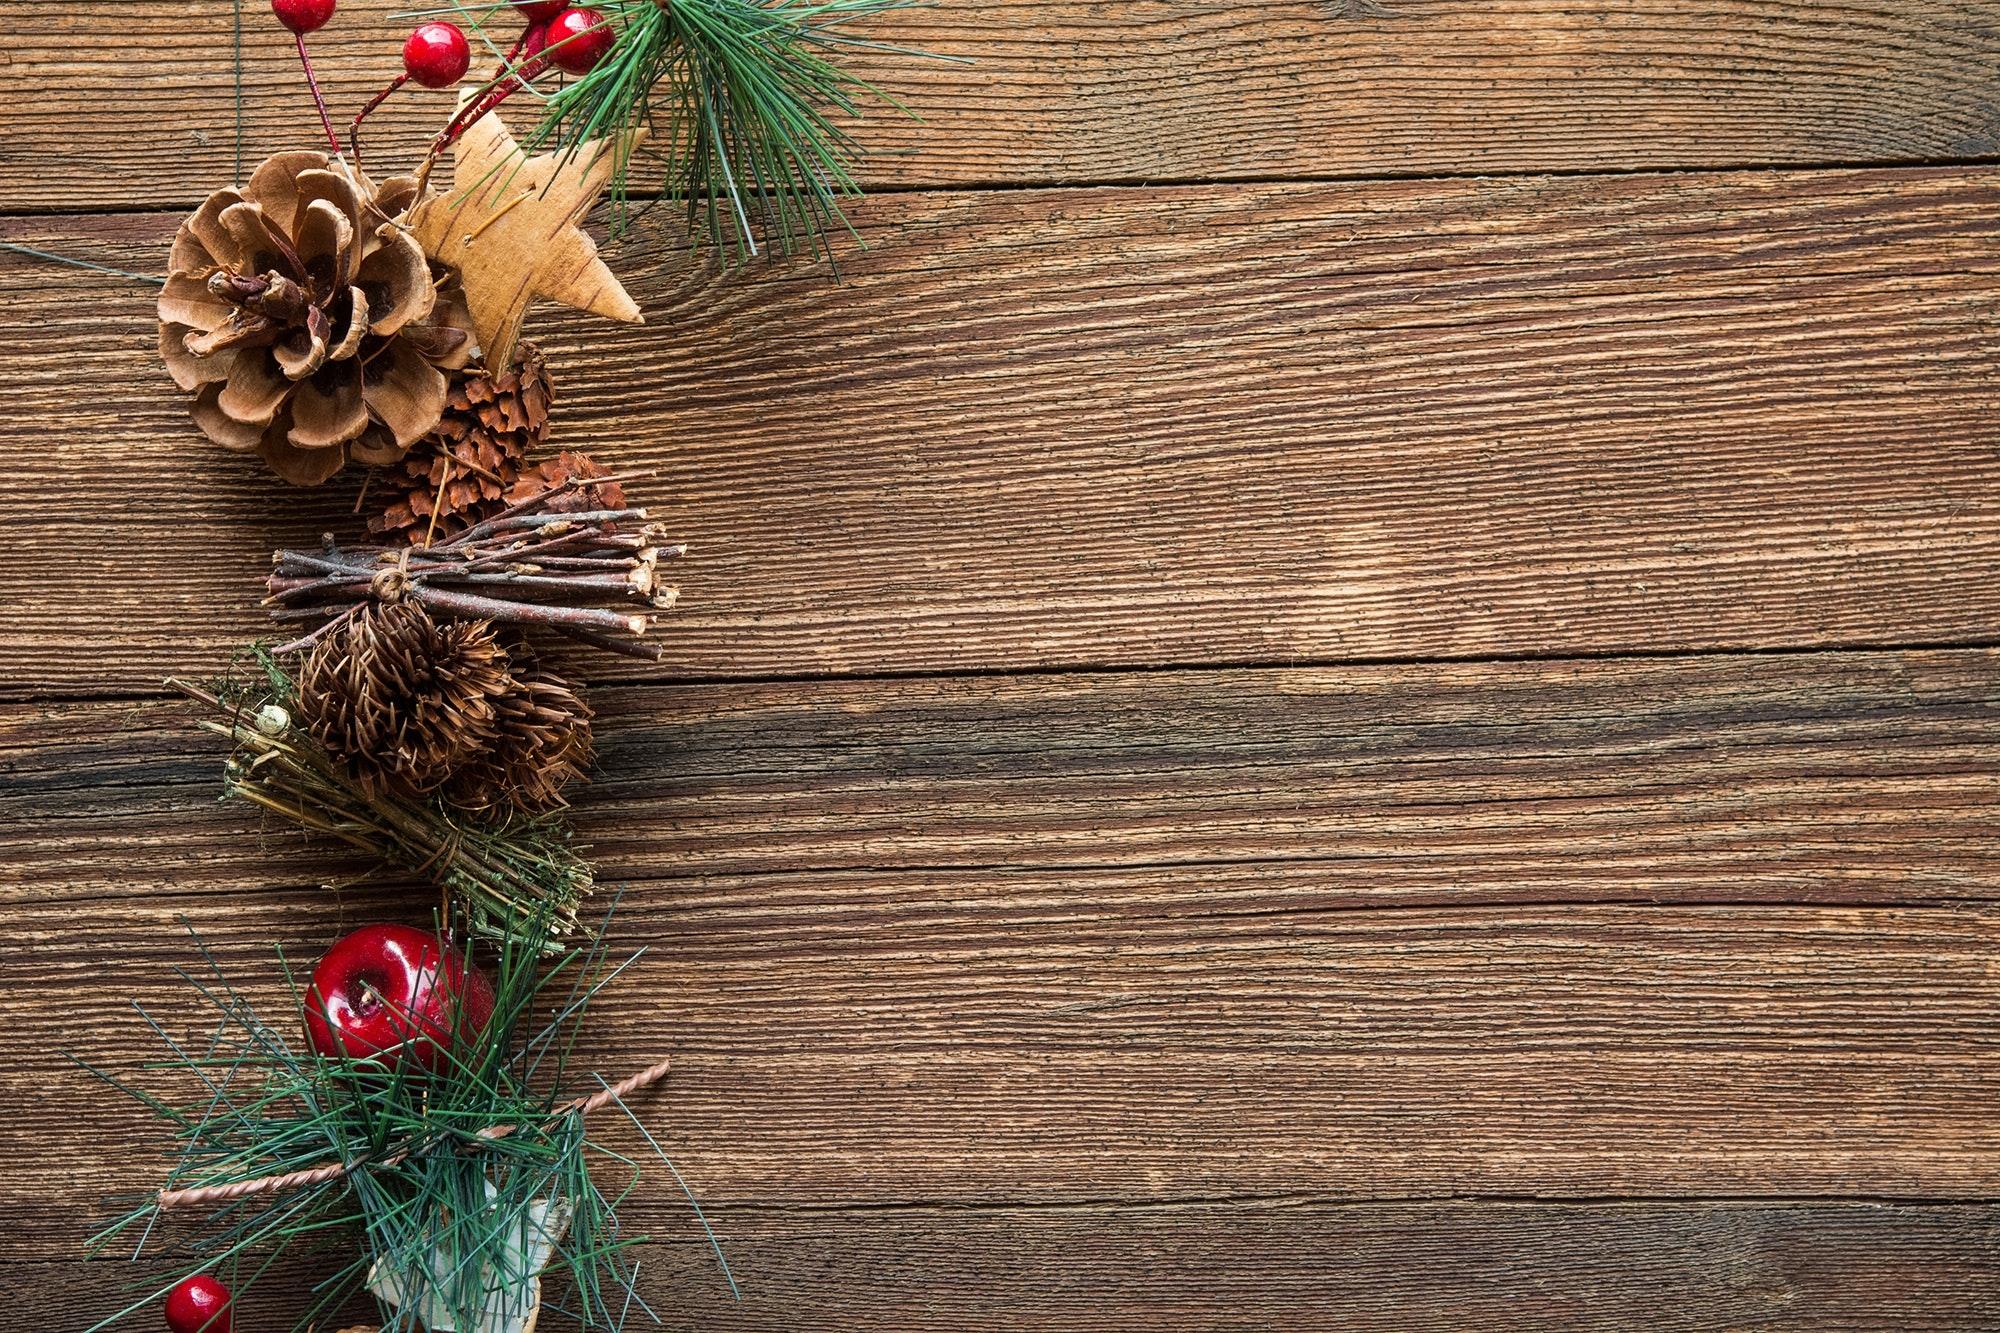 Most Inspiring Wallpaper Christmas Wood - pexels-photo-220098  HD_137255 .jpg\u0026fm\u003djpg